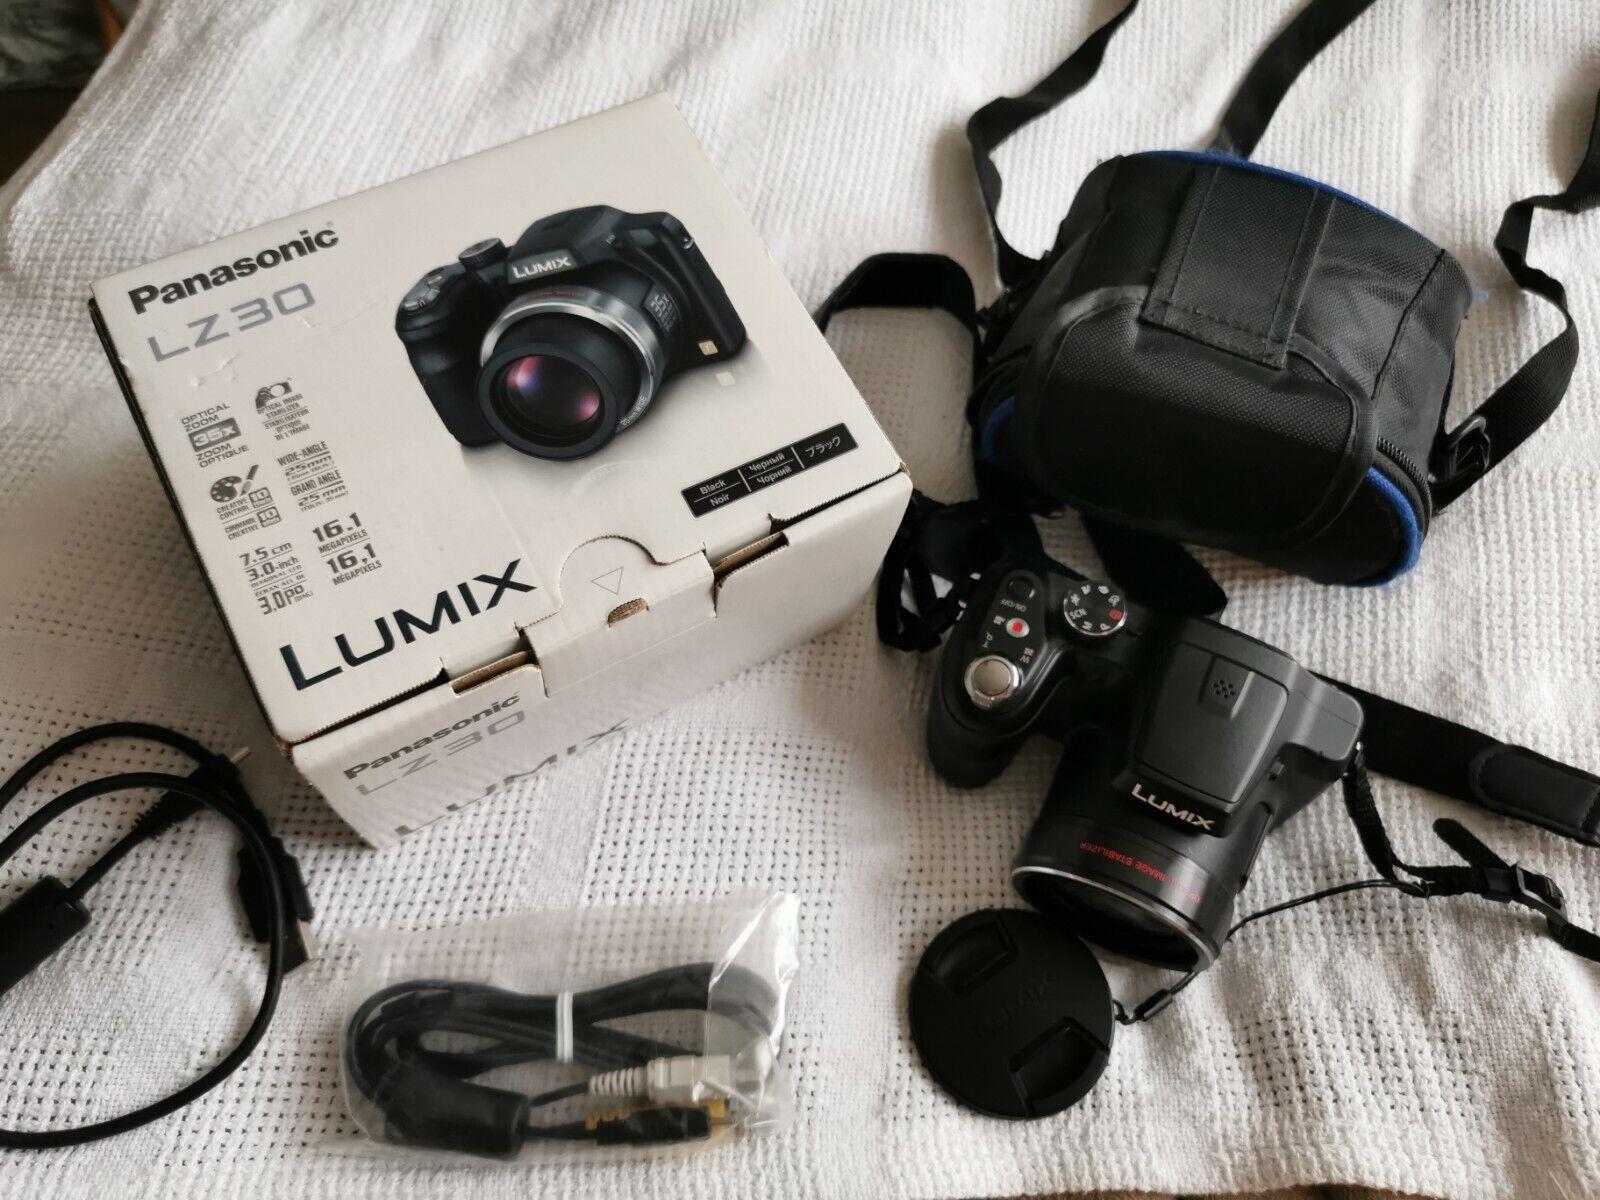 Panasonic LZ 3O Camera Boxed With A Bag